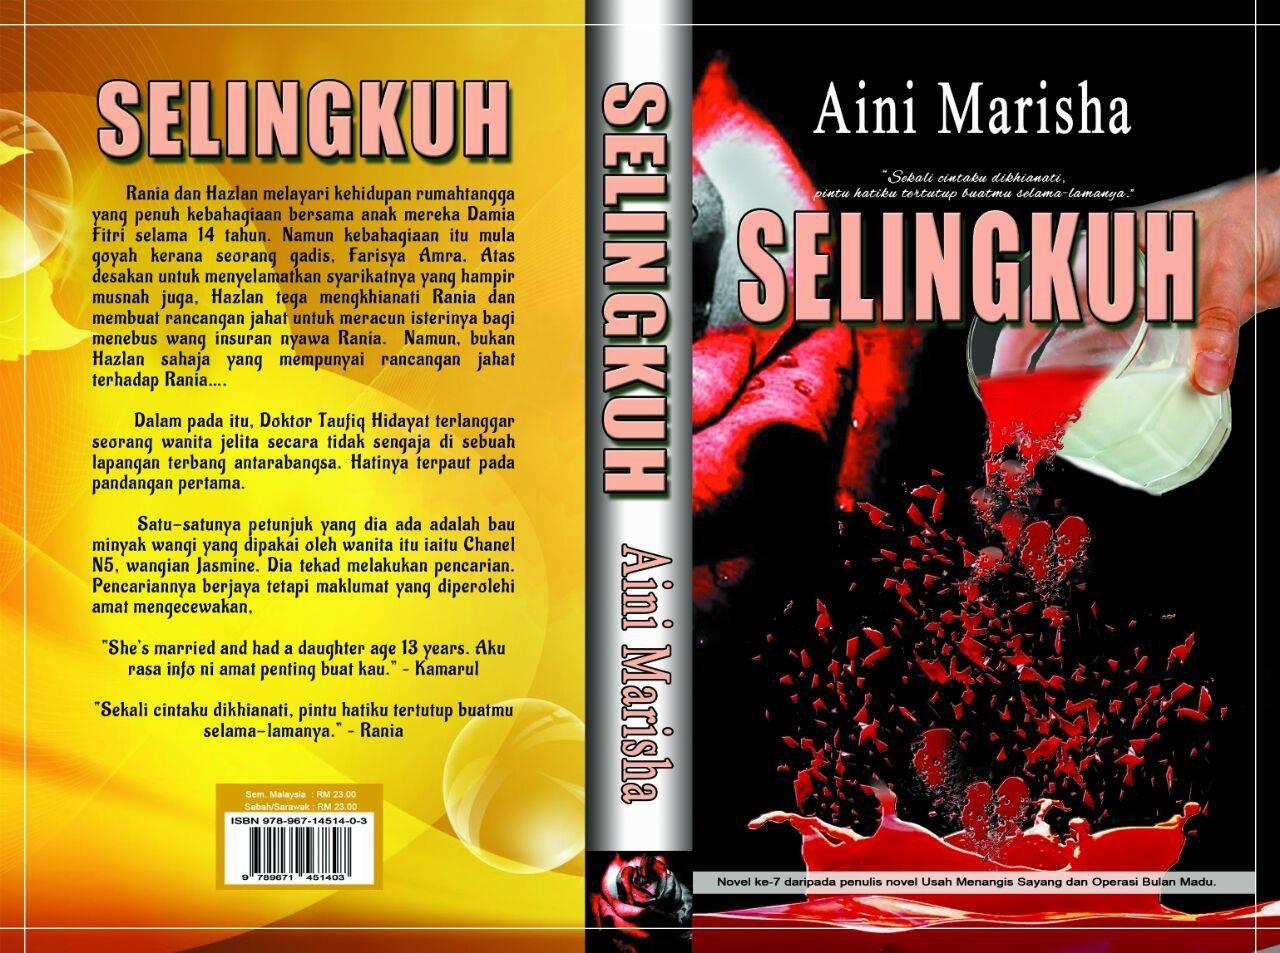 SELINGKUH (OKTOBER 2016) RM23.00